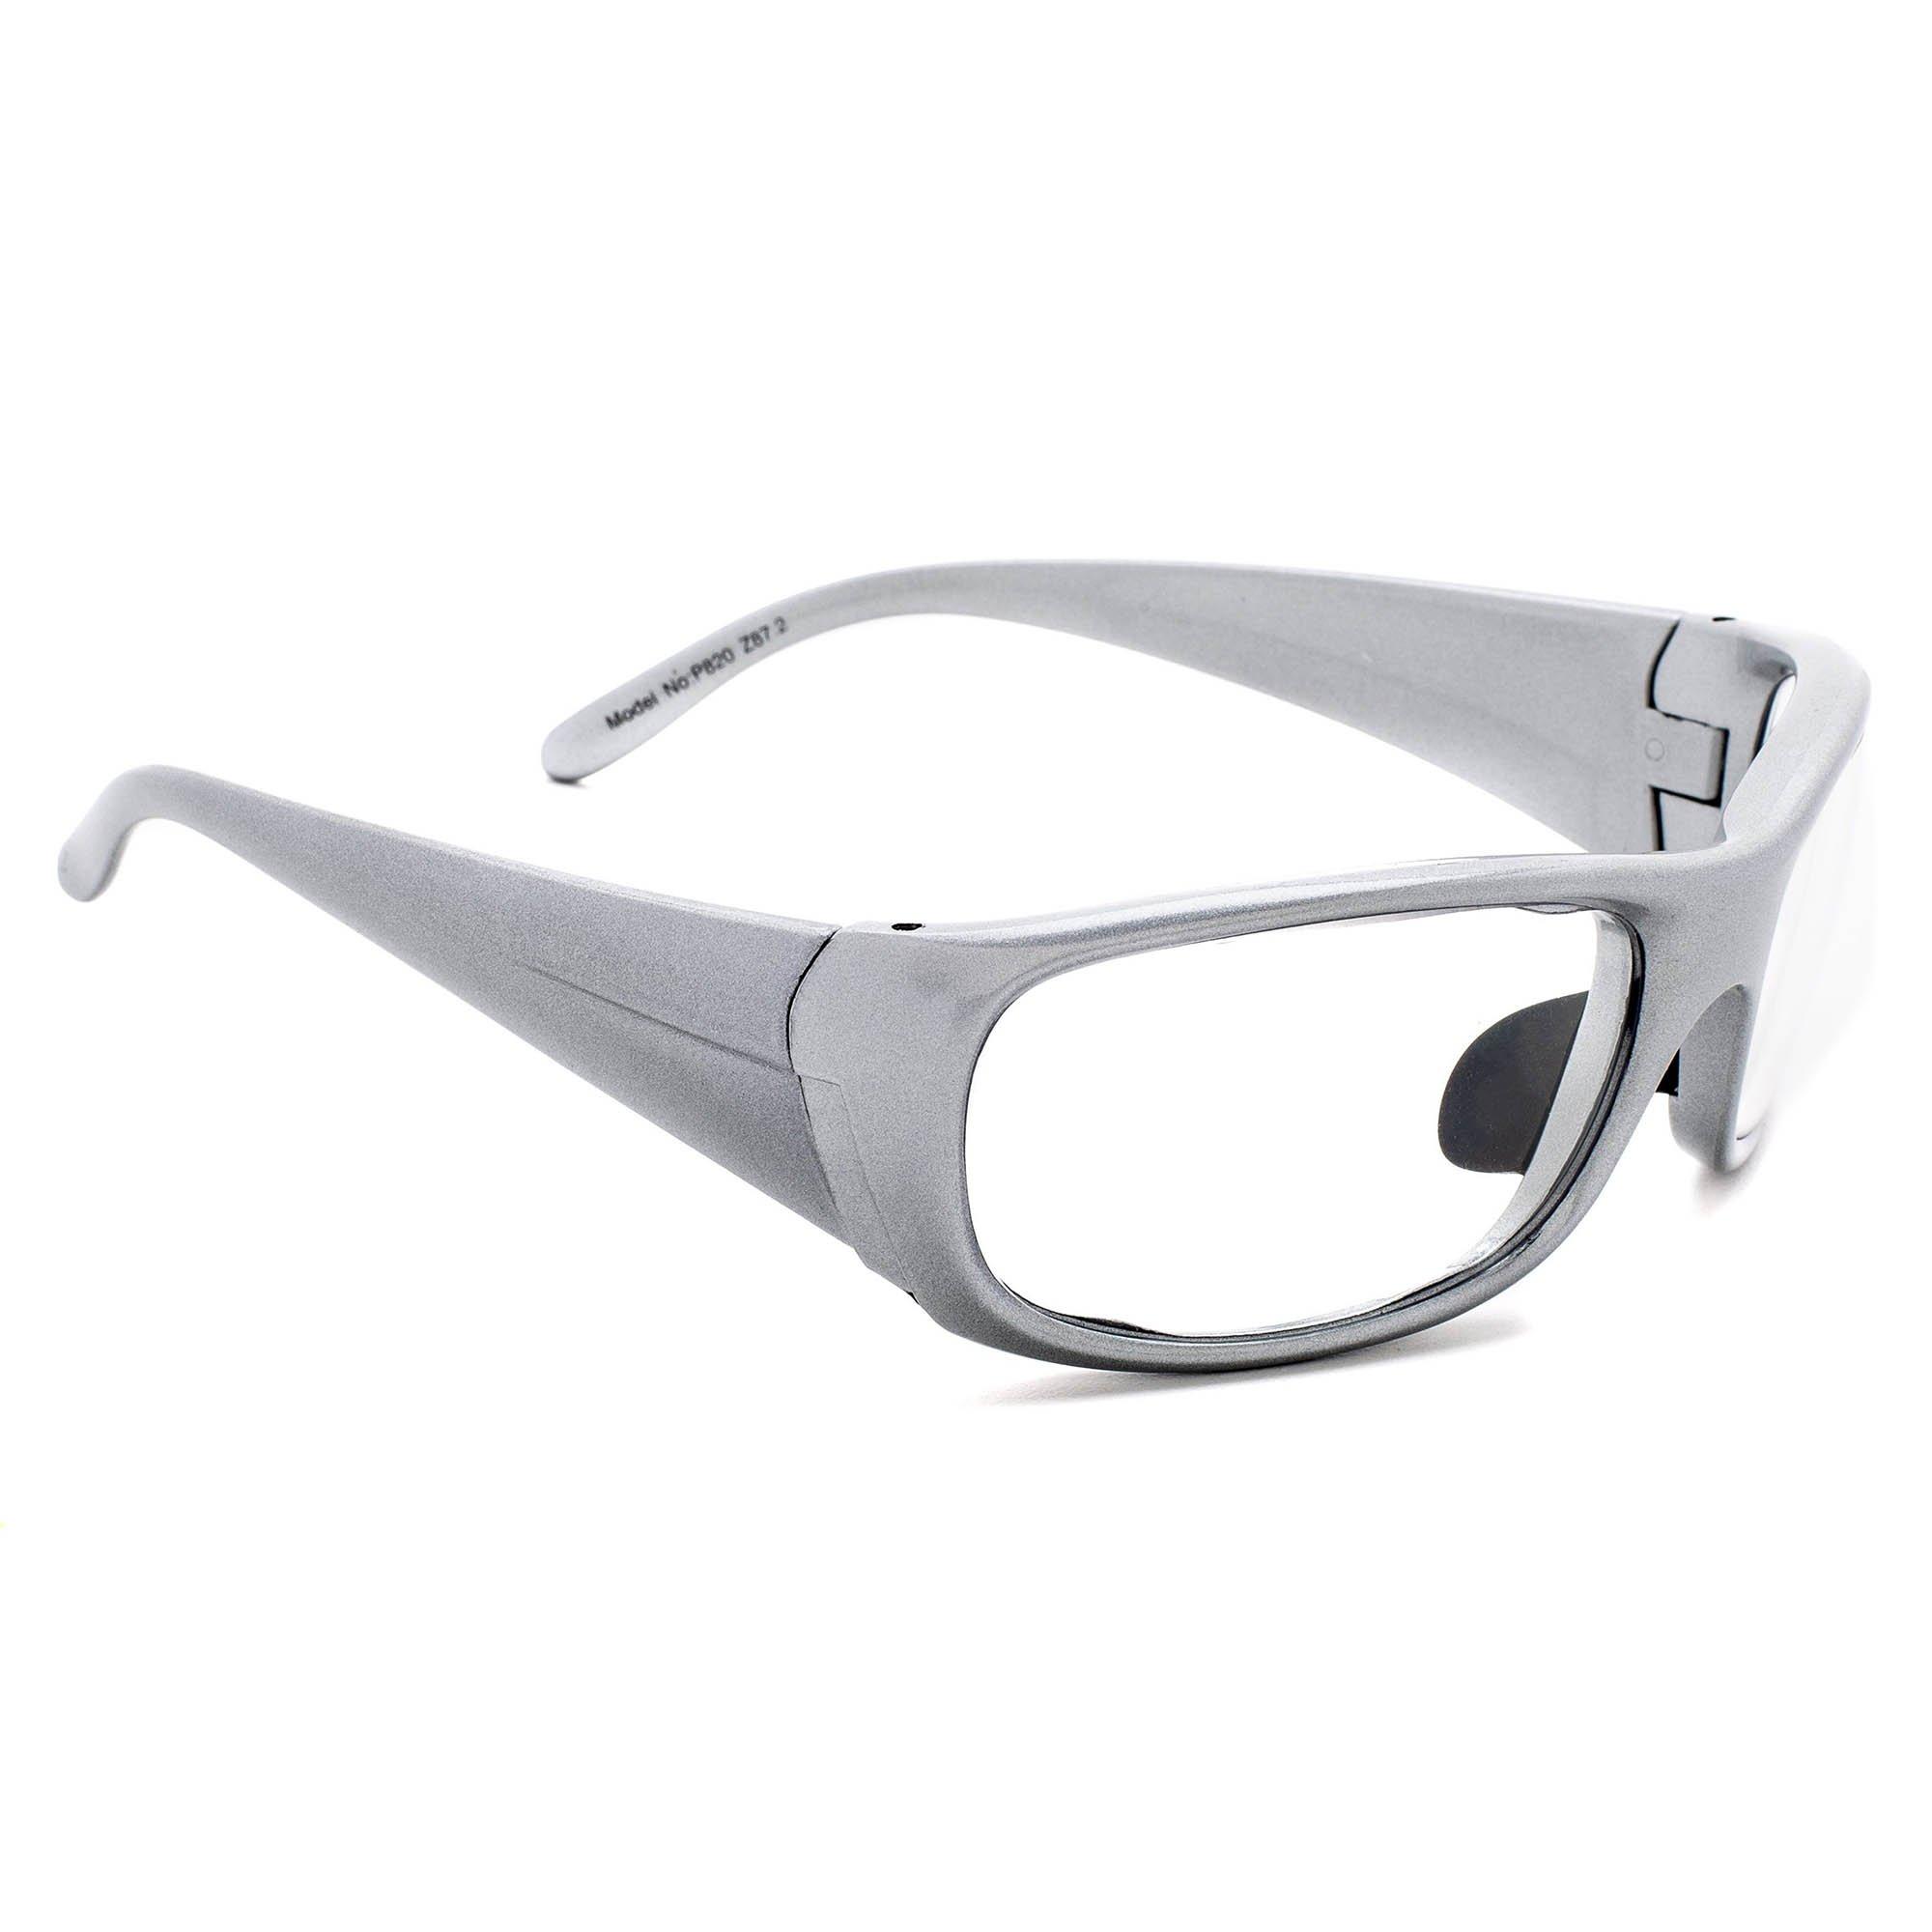 Leaded Glasses Radiation Protective Eyewear Model JY7 Black Phillips-Safety